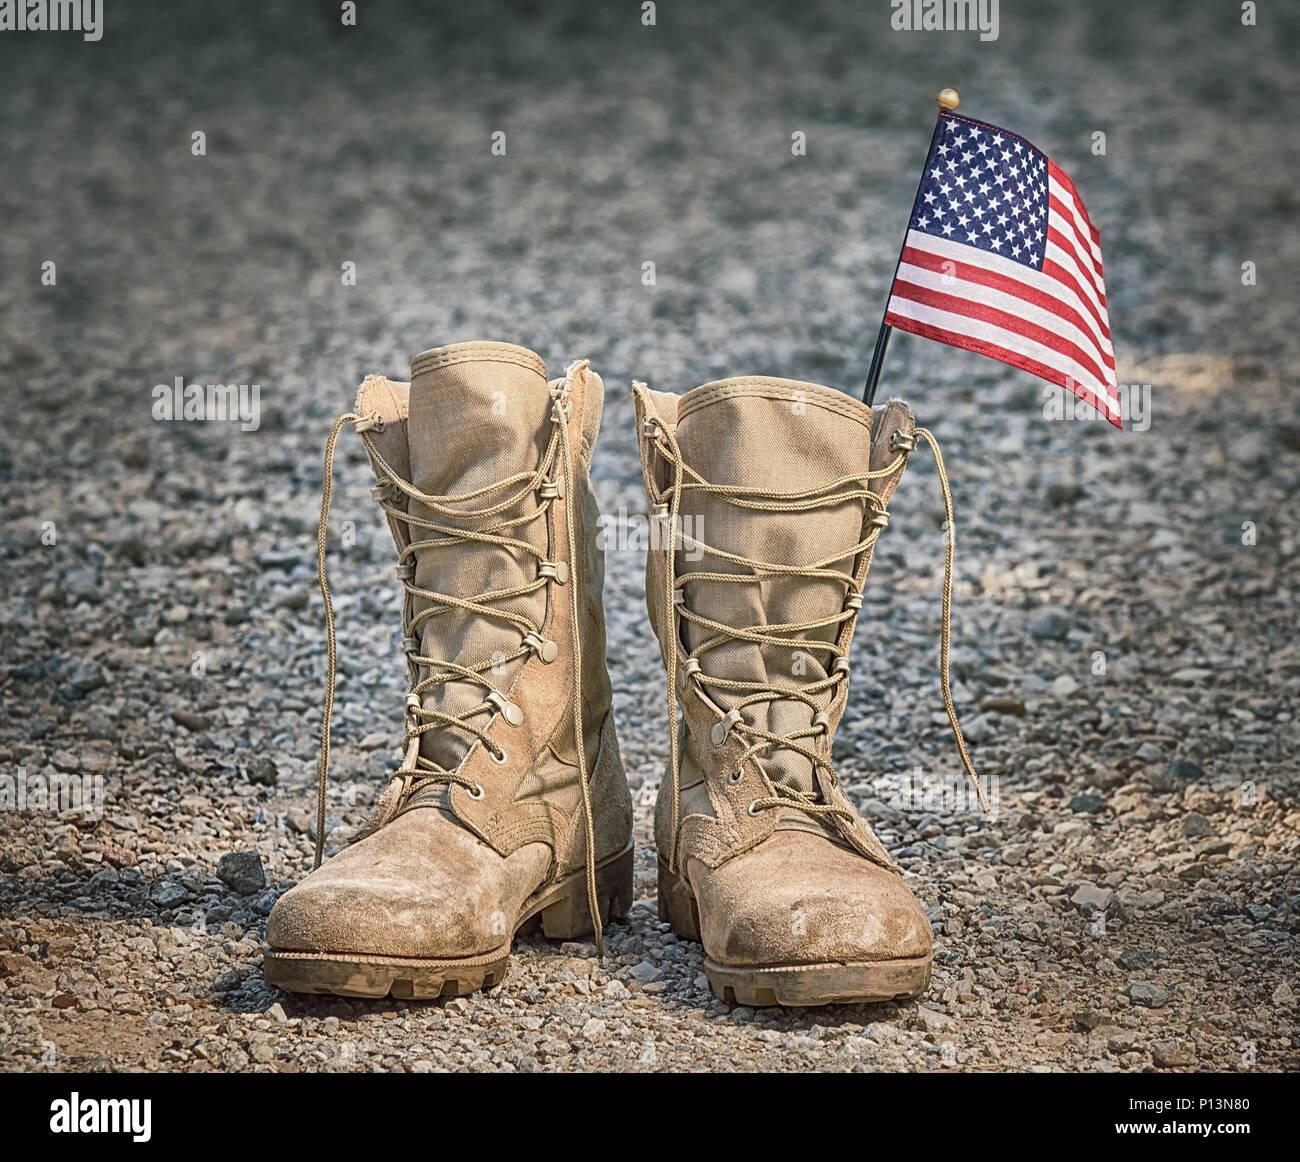 Army Desert Boots Immagini e Fotos Stock Alamy